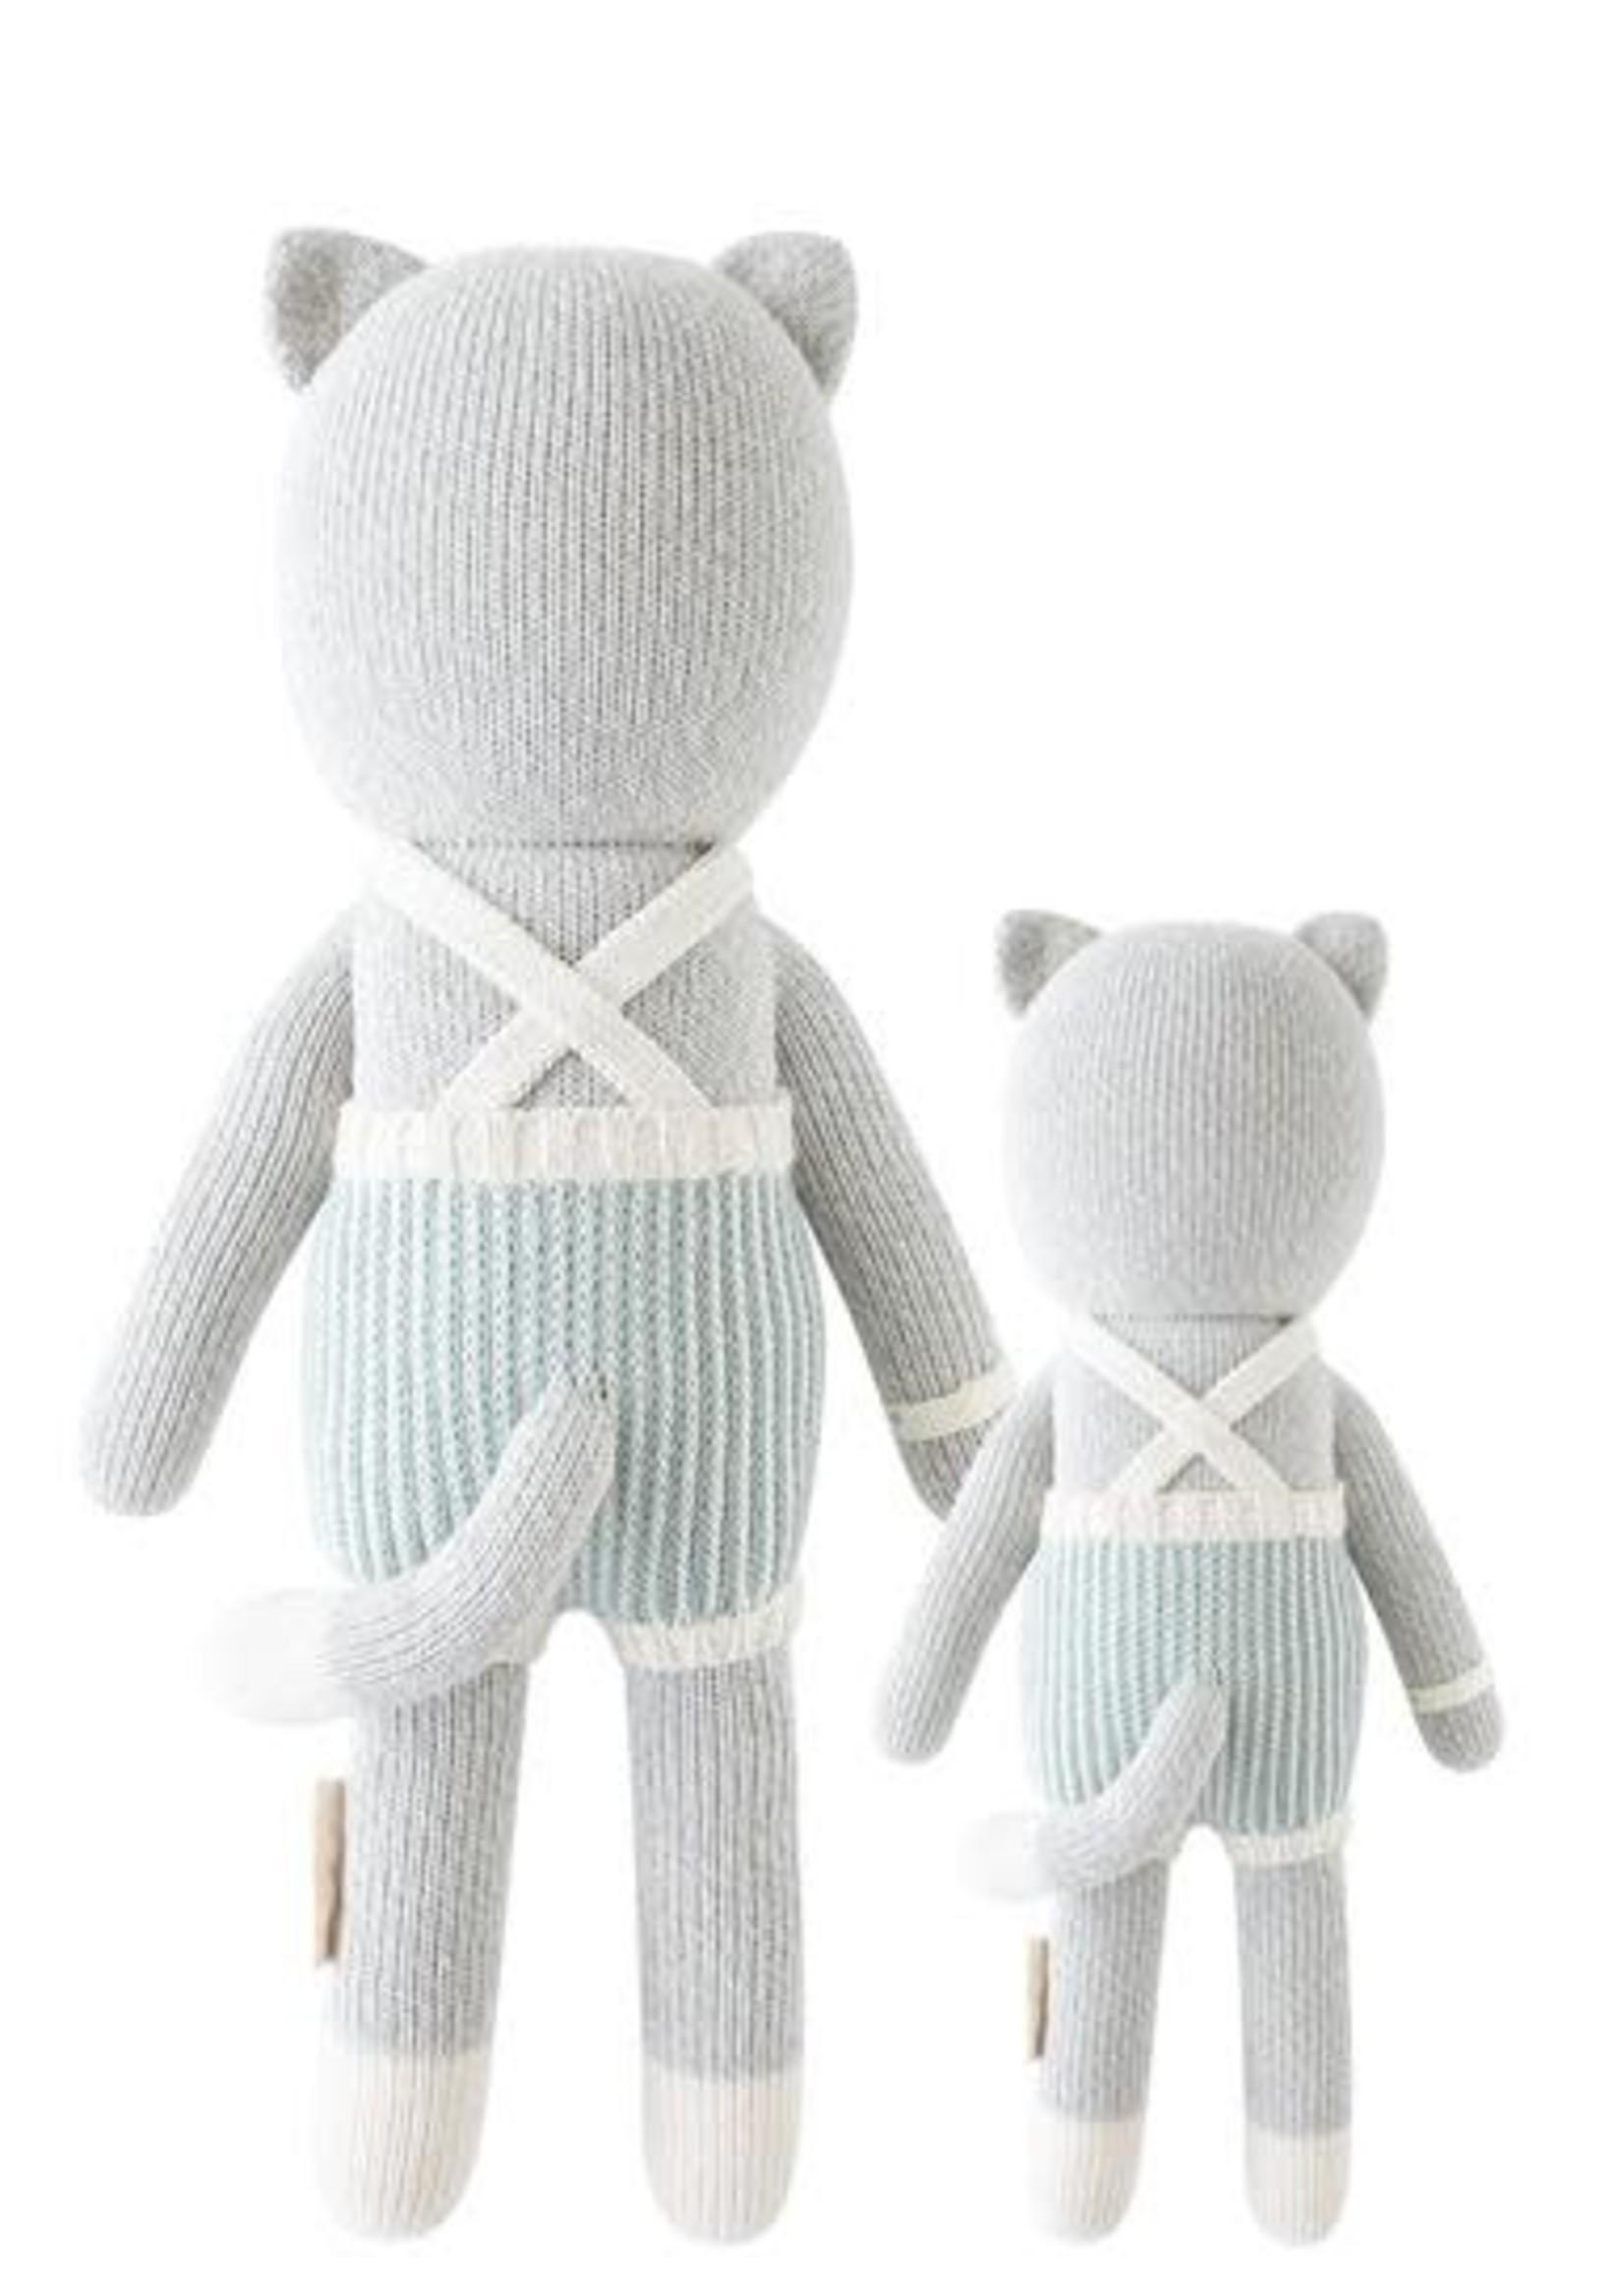 cuddle + kind Kitten Knit Doll DYLAN